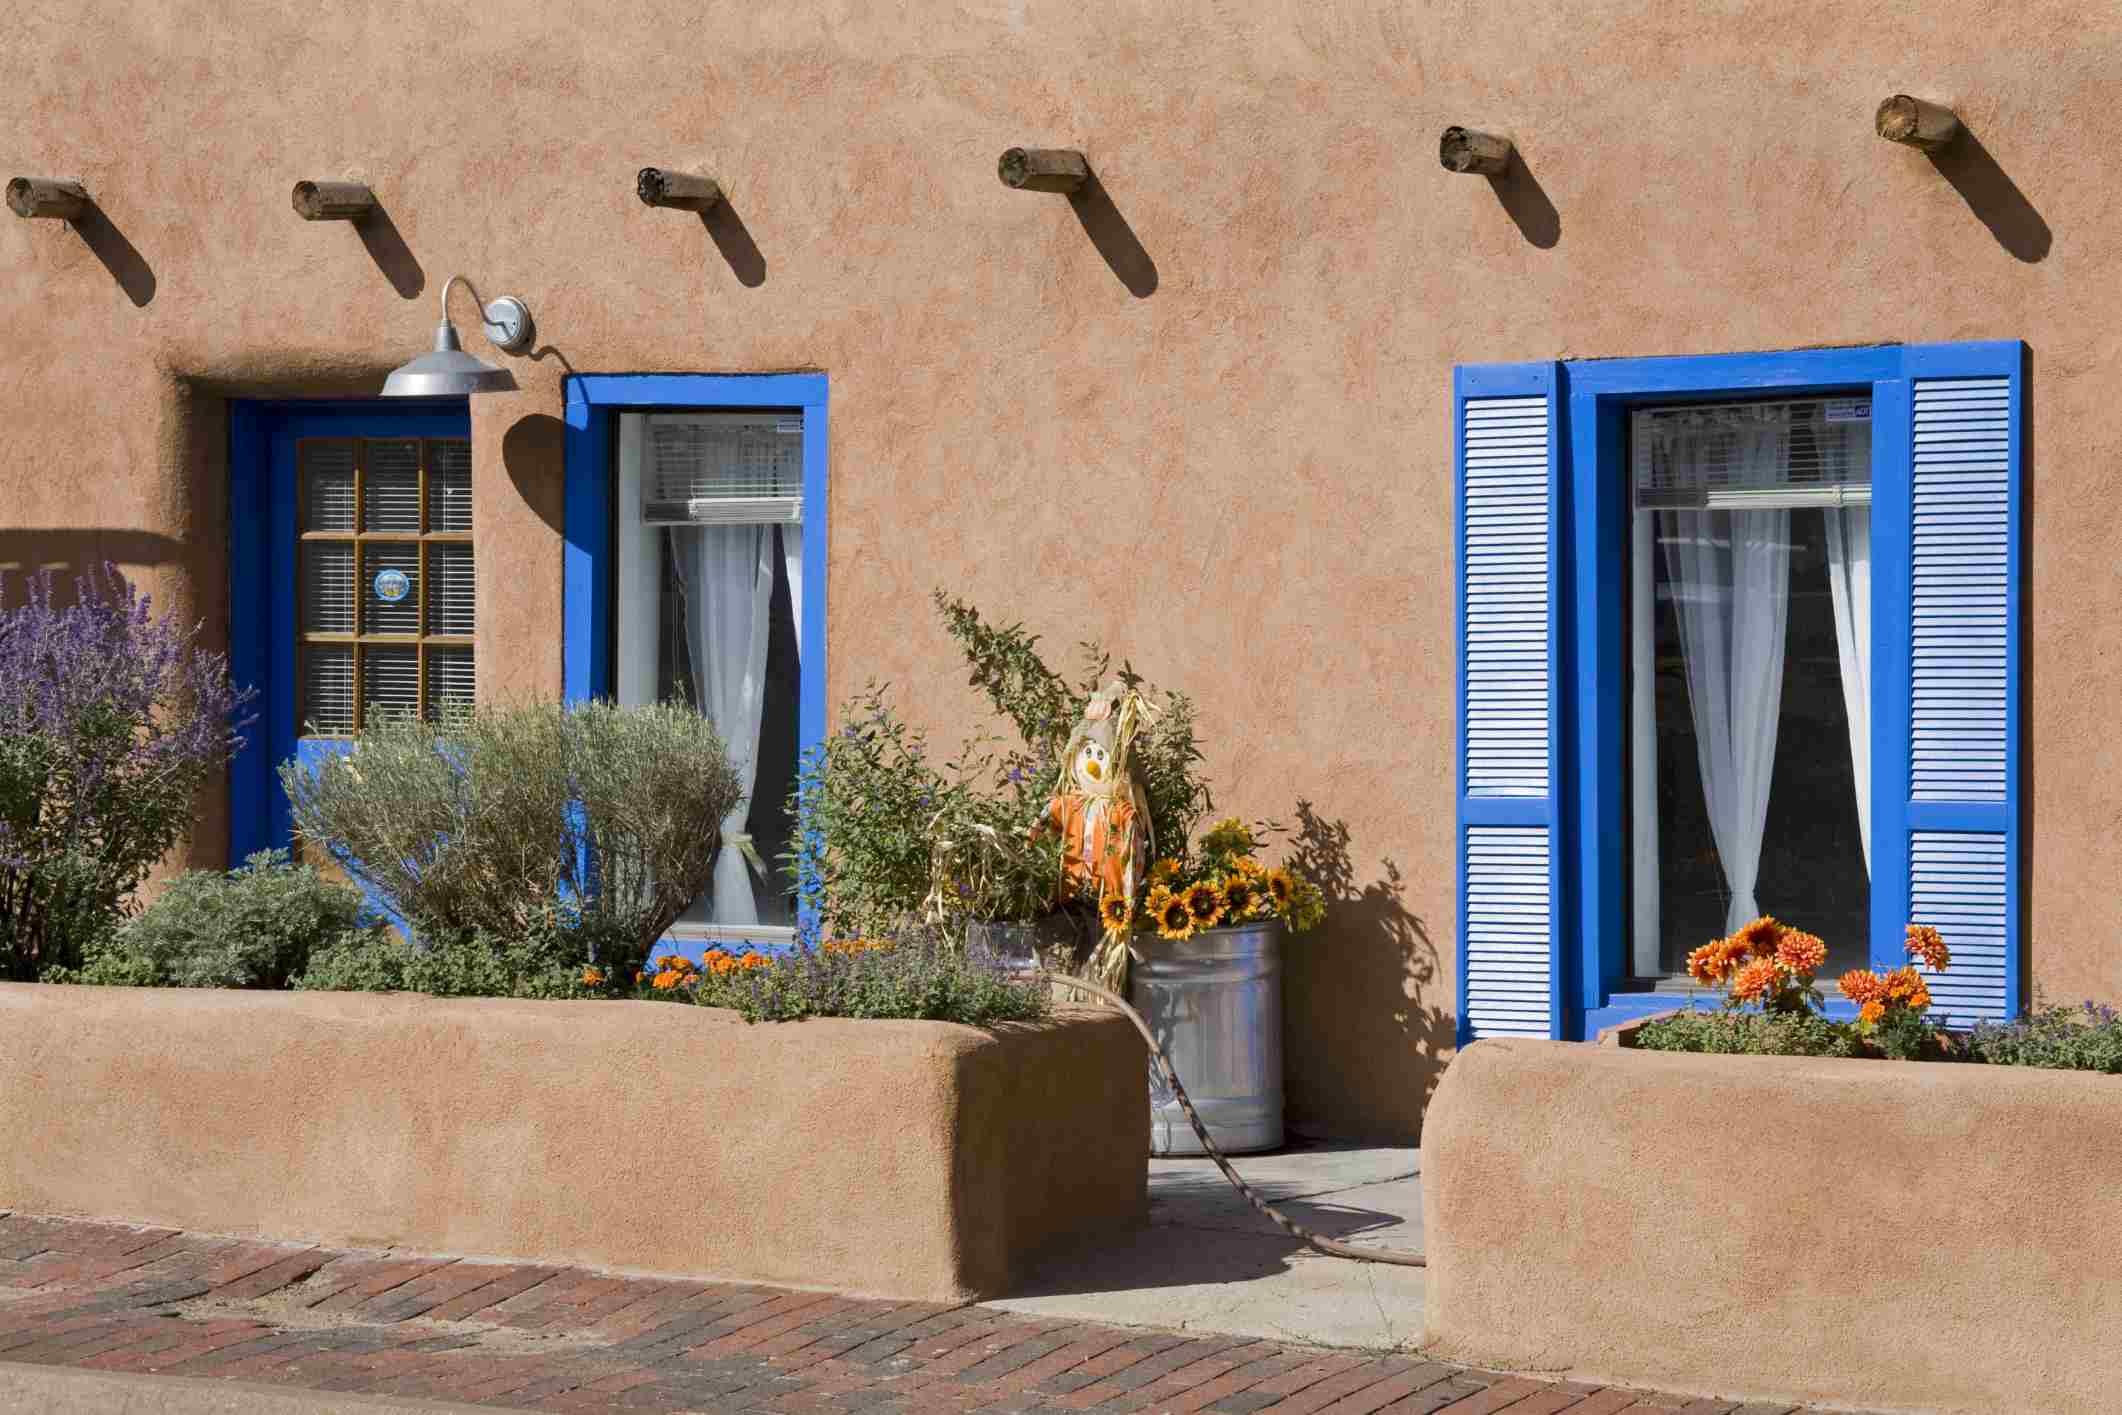 Destination Inspiration: Colors of Santa Fe